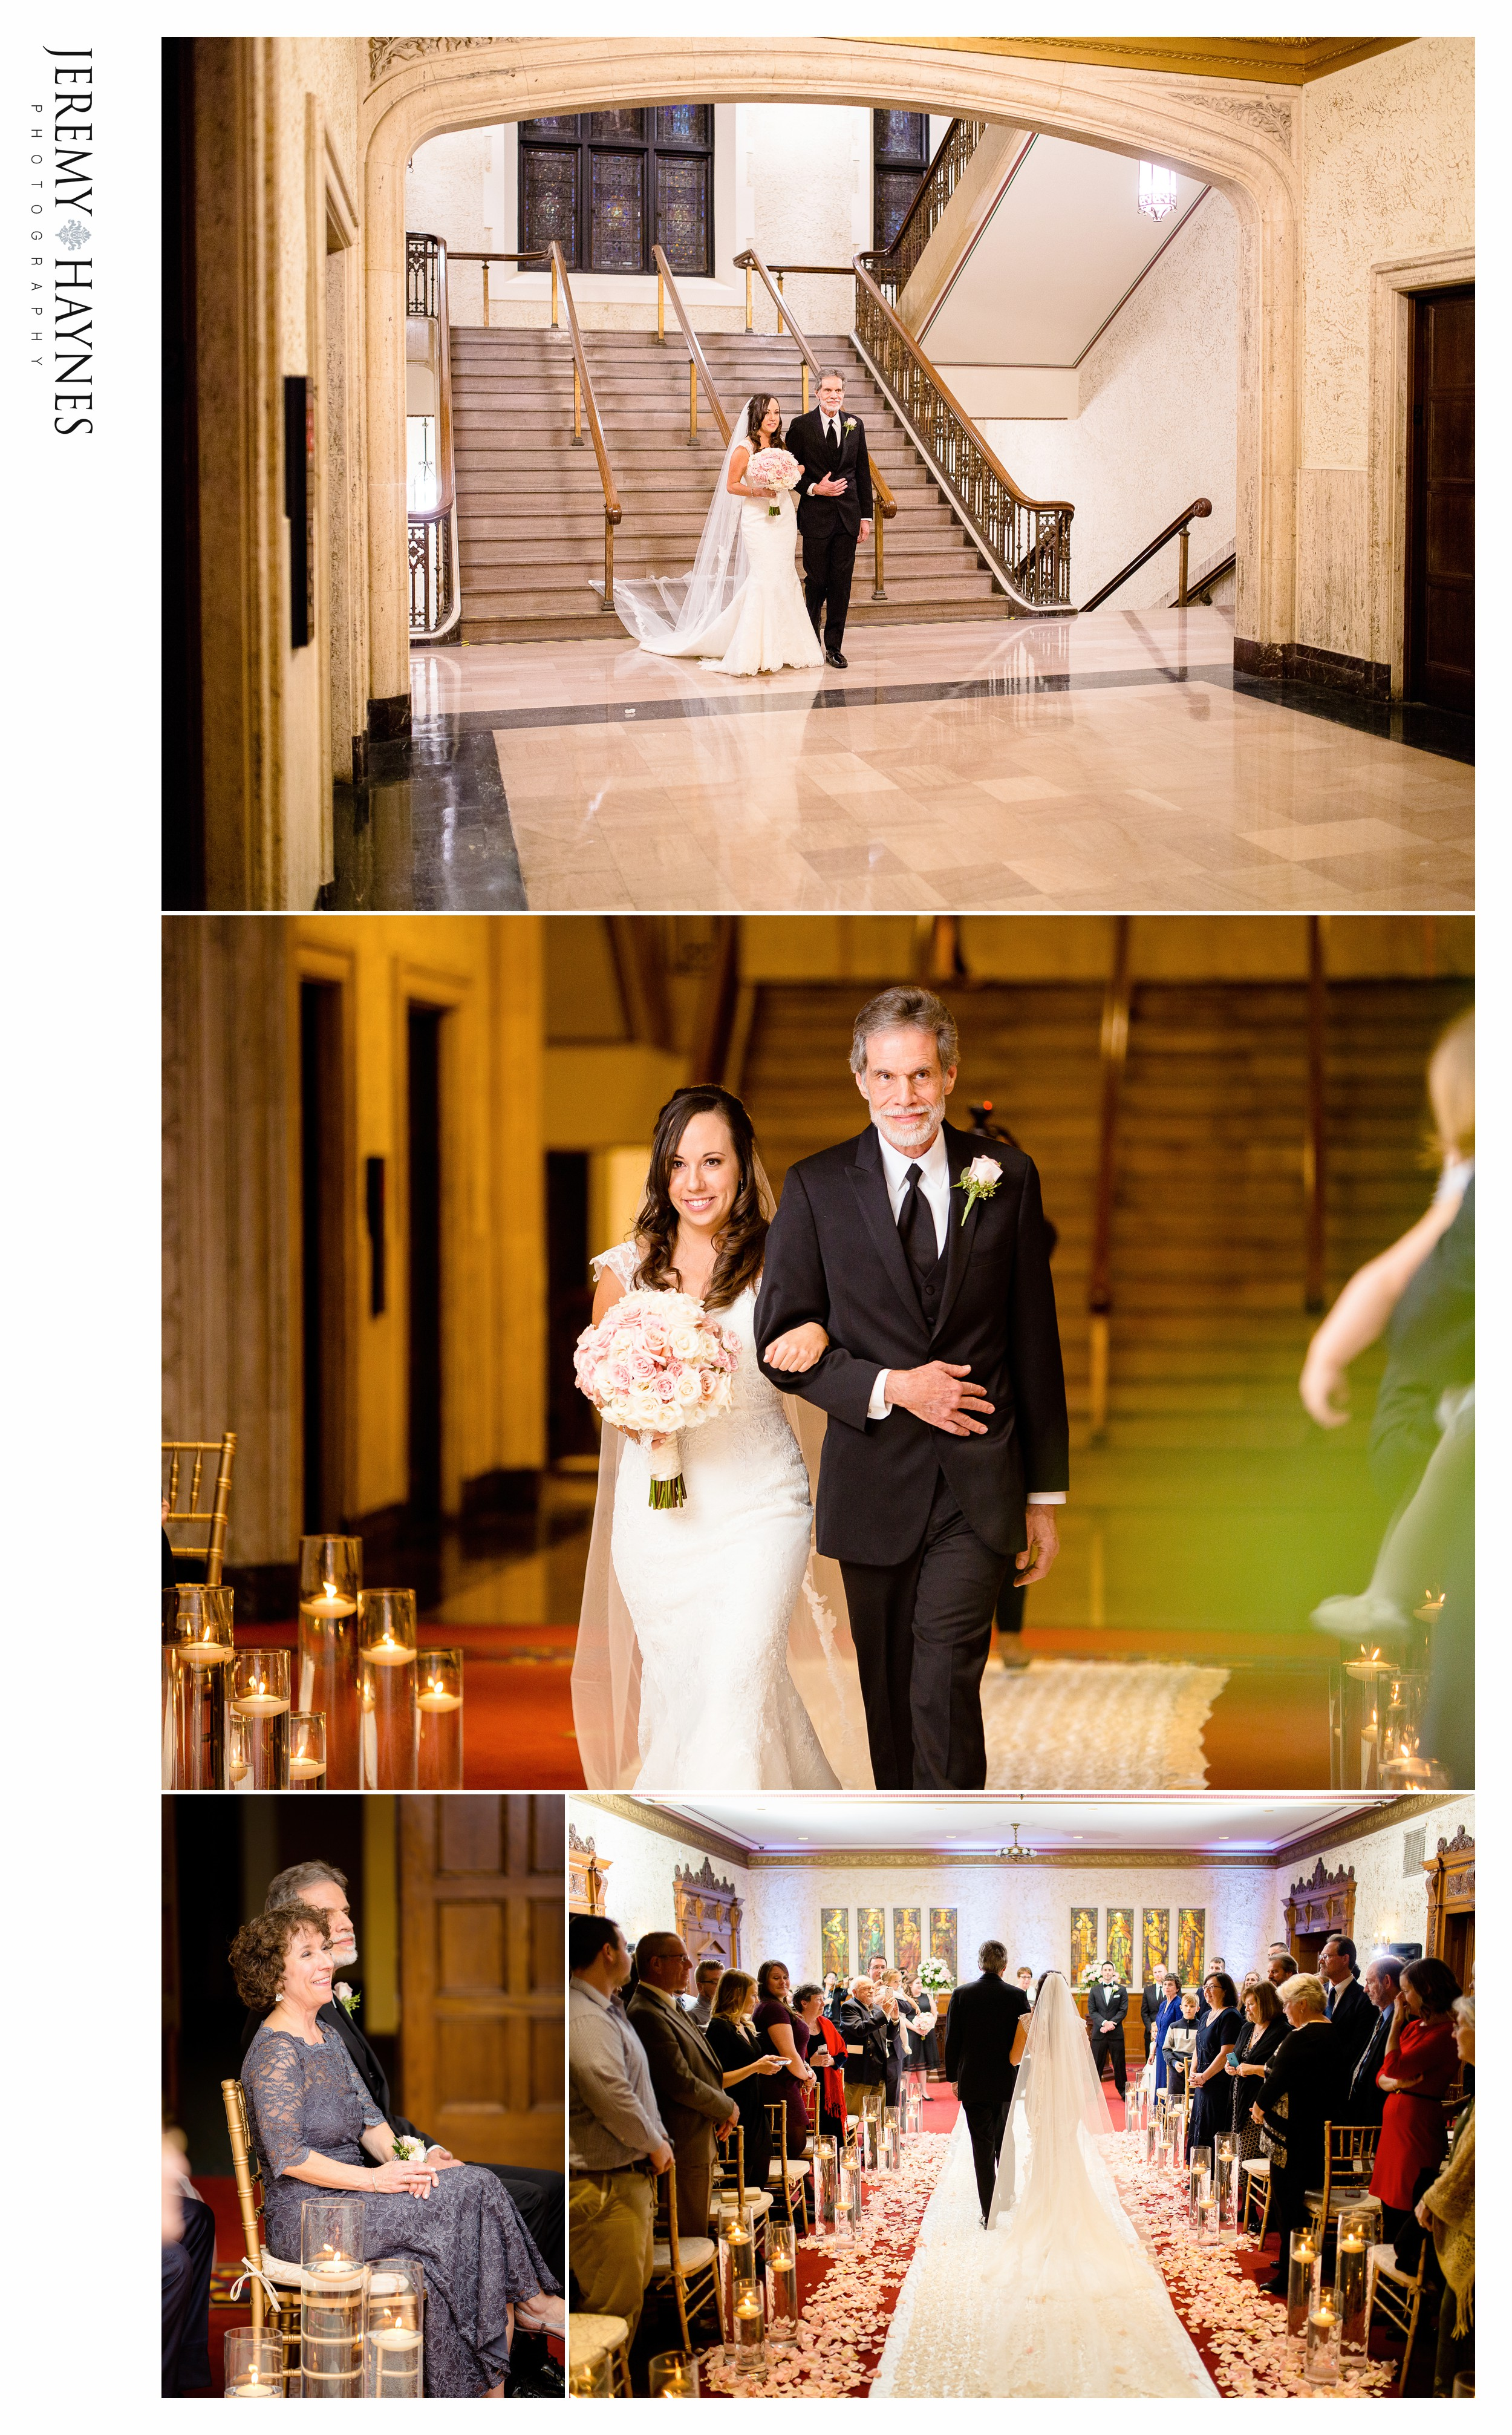 bride-at-scottish-rite-cathedral.jpg